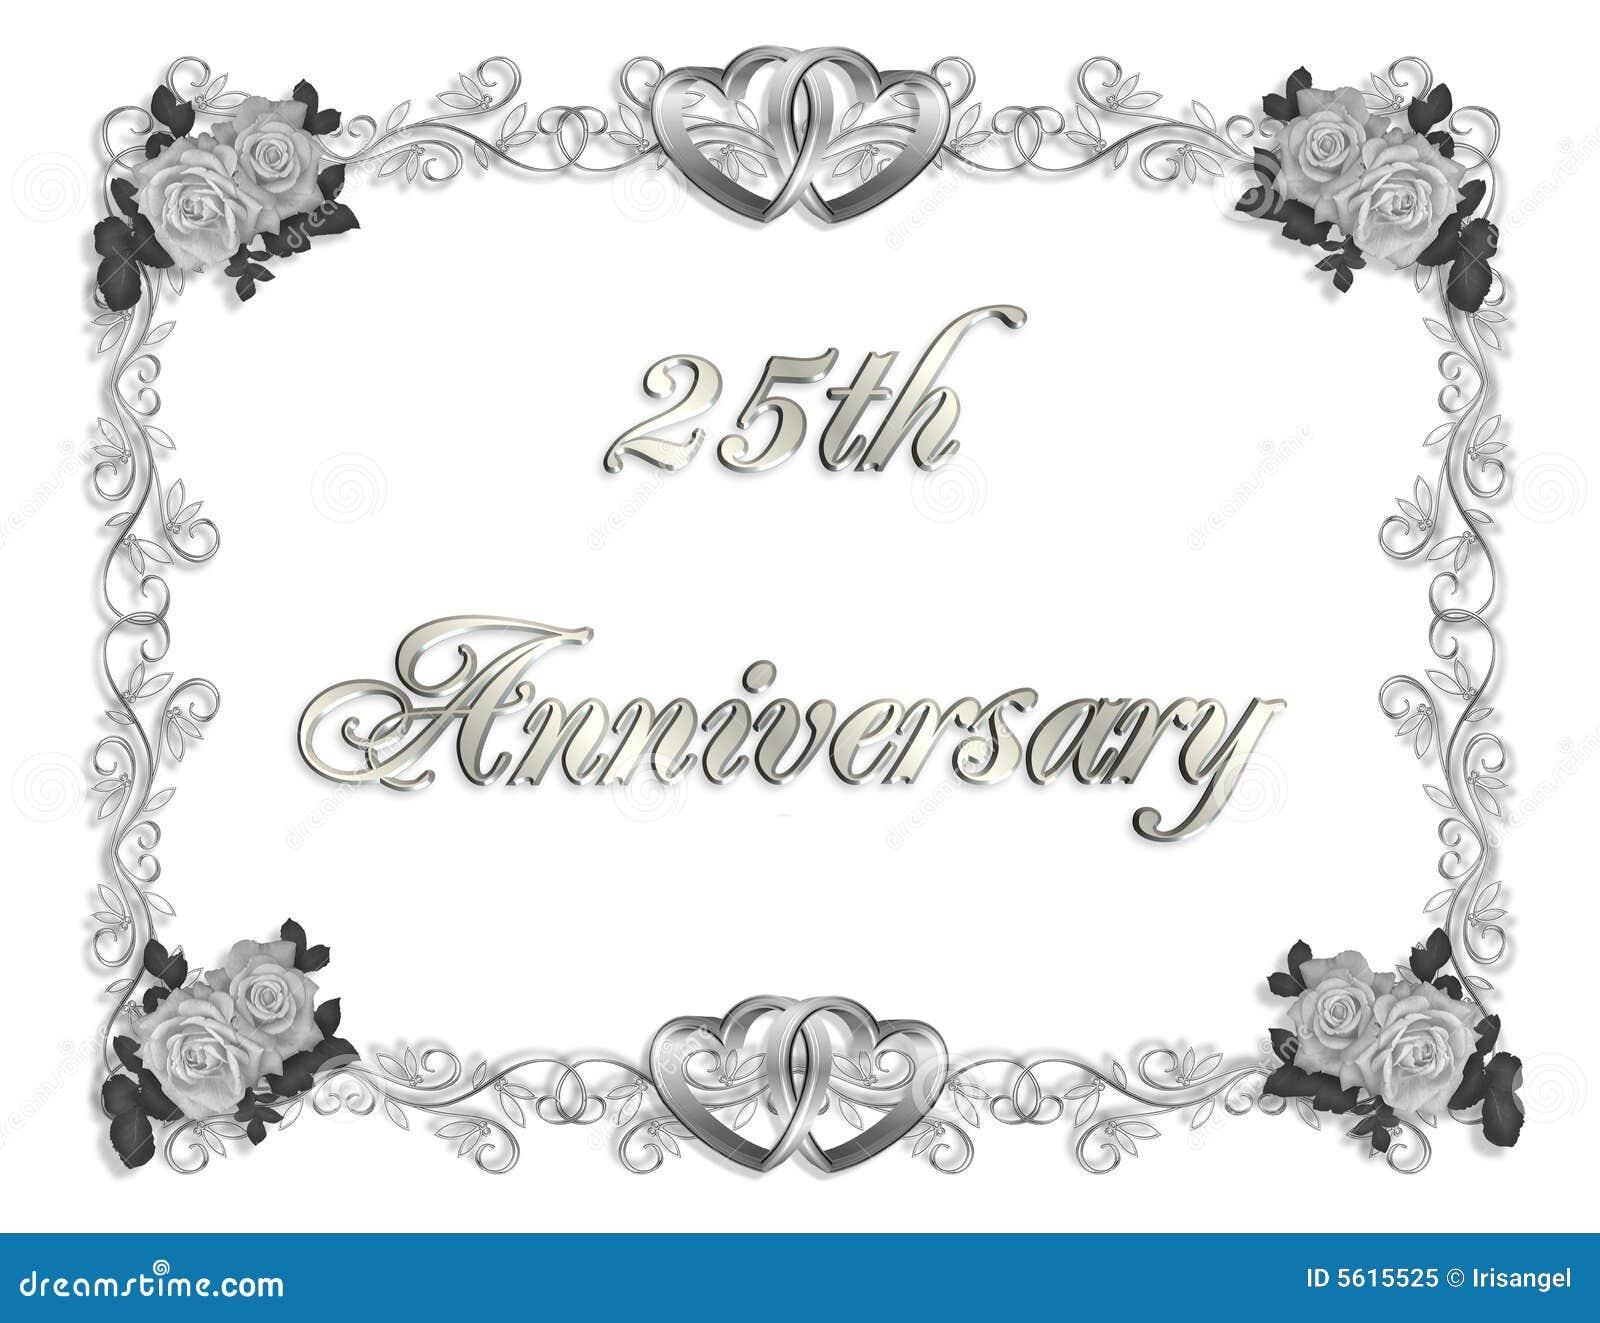 25th anniversary invitation 3d stock illustration illustration of